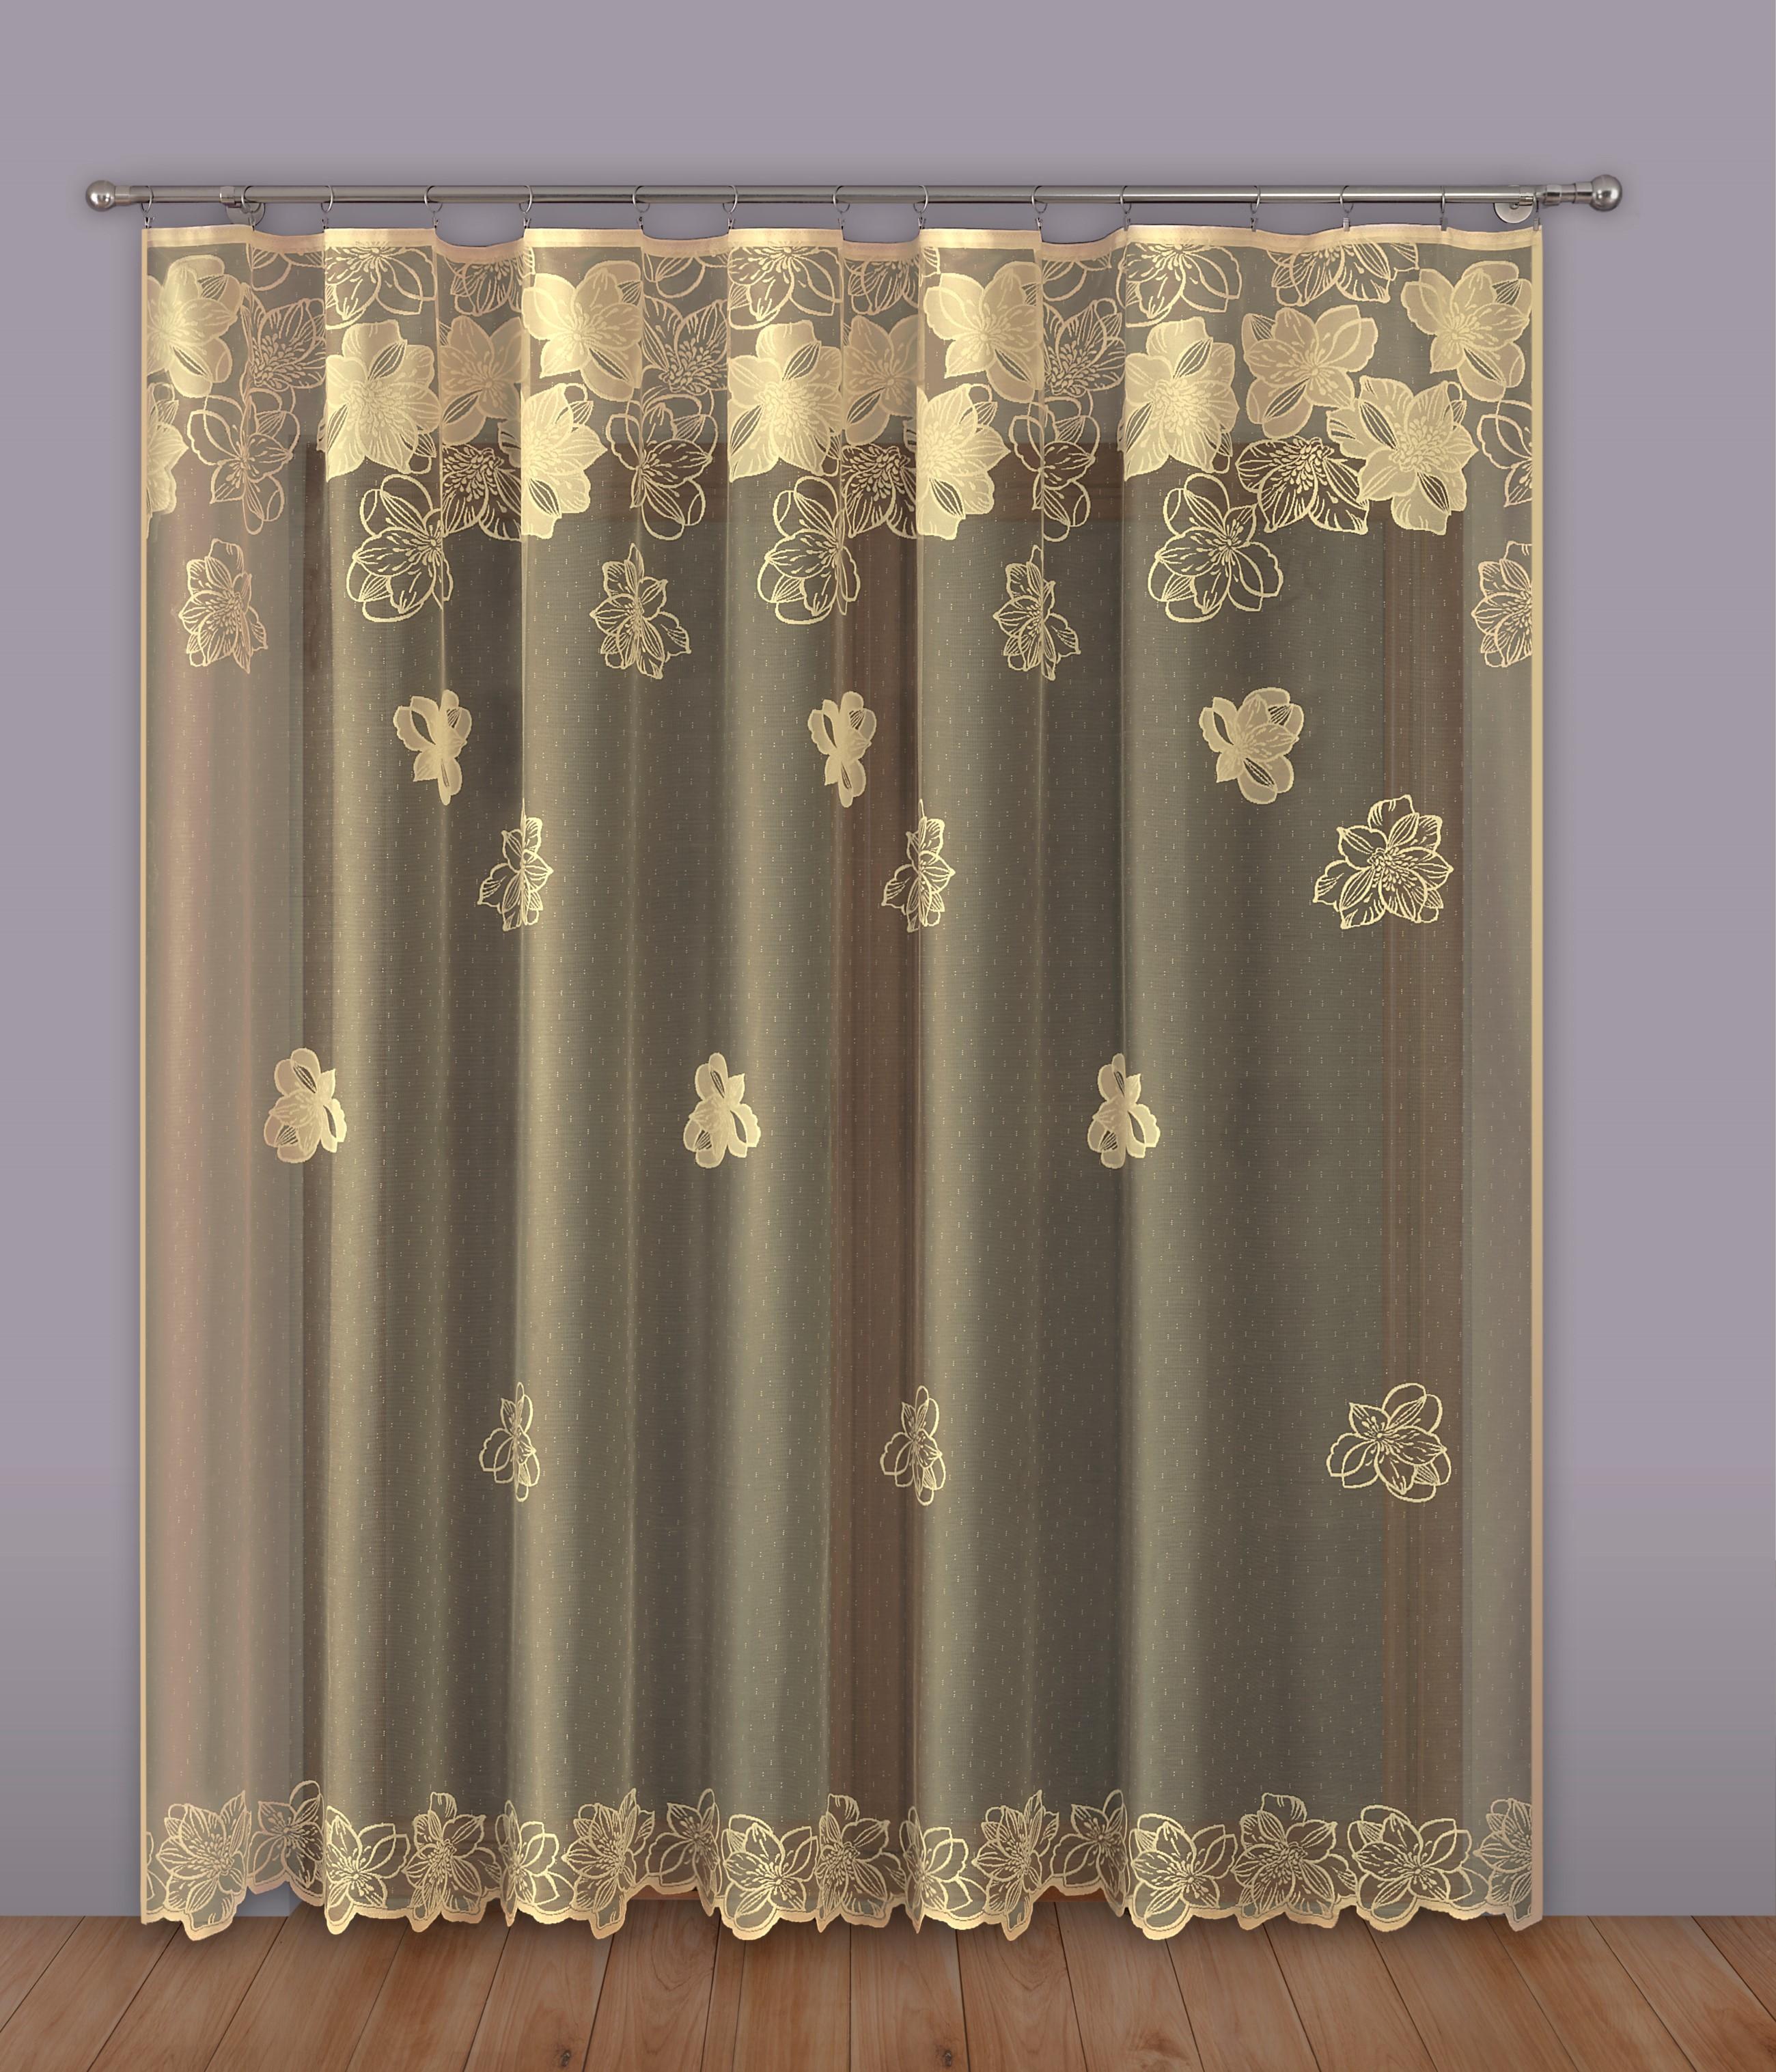 Шторы Primavera Классические шторы Maev Цвет: Персиковый шторы primavera классические шторы maev цвет салатовый